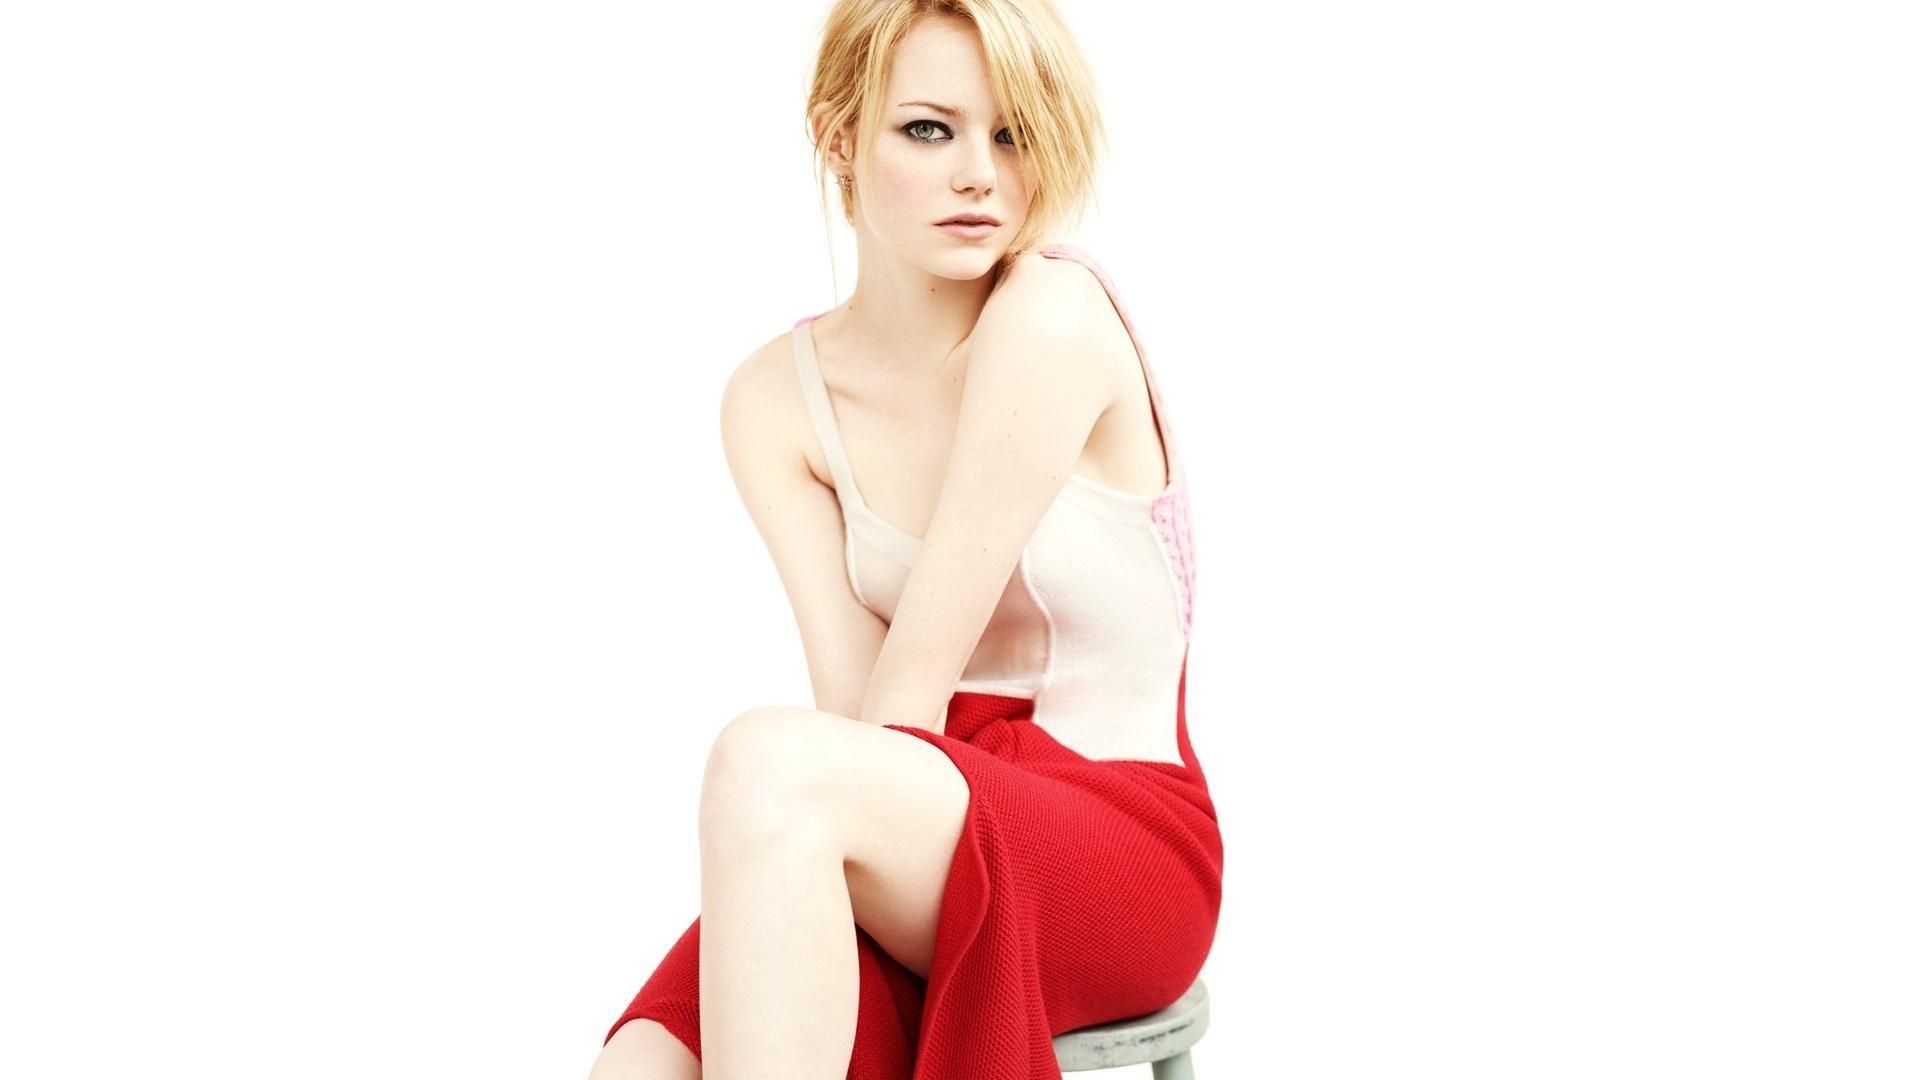 Emma Stone 2013 EmmaStone HD Wallpaper